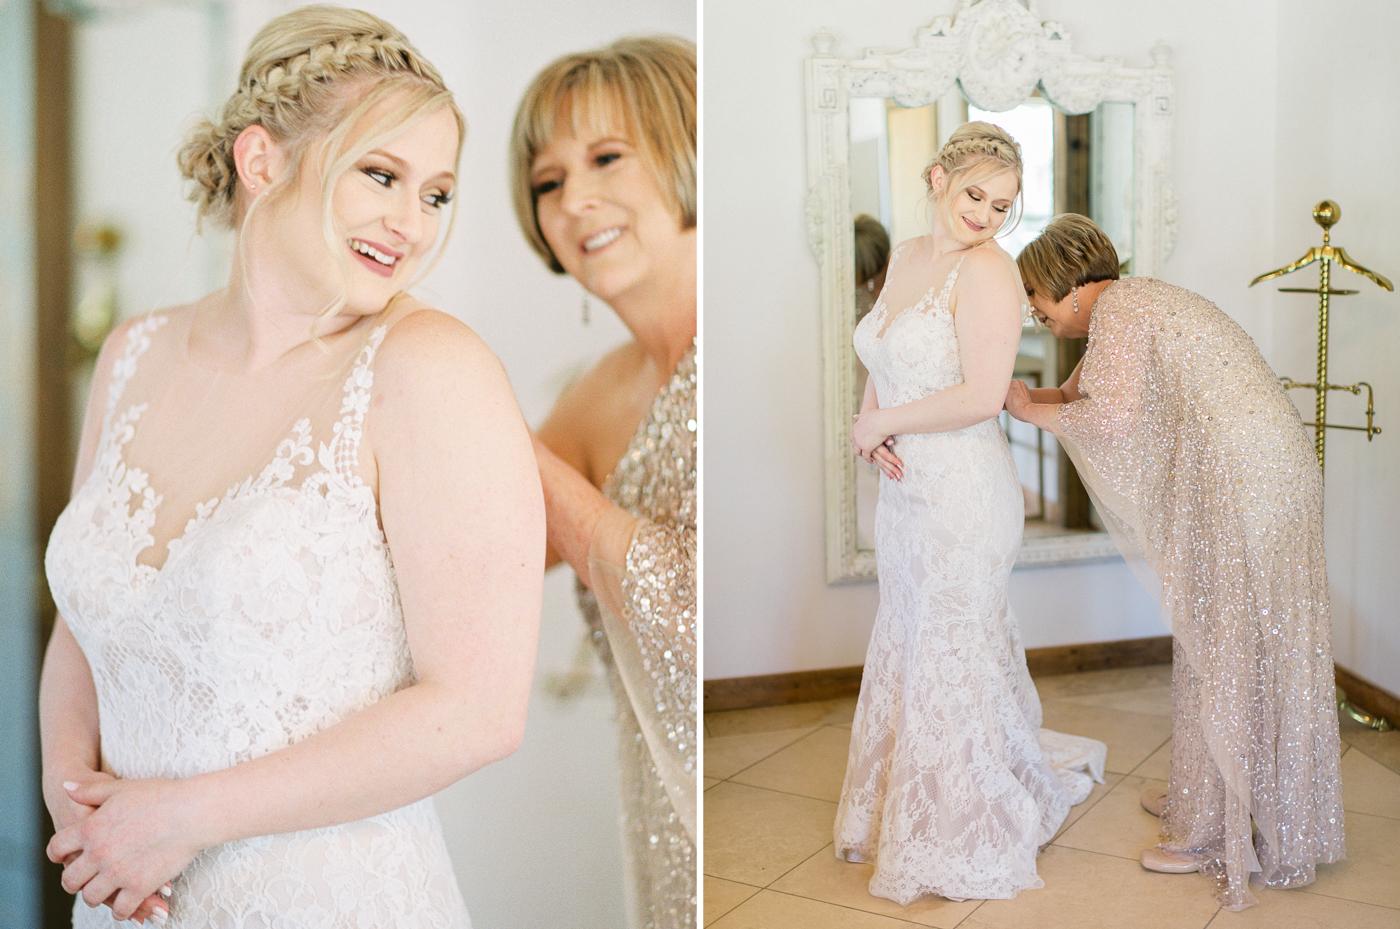 Wichita Falls, TX - Elegant Wedding Photography